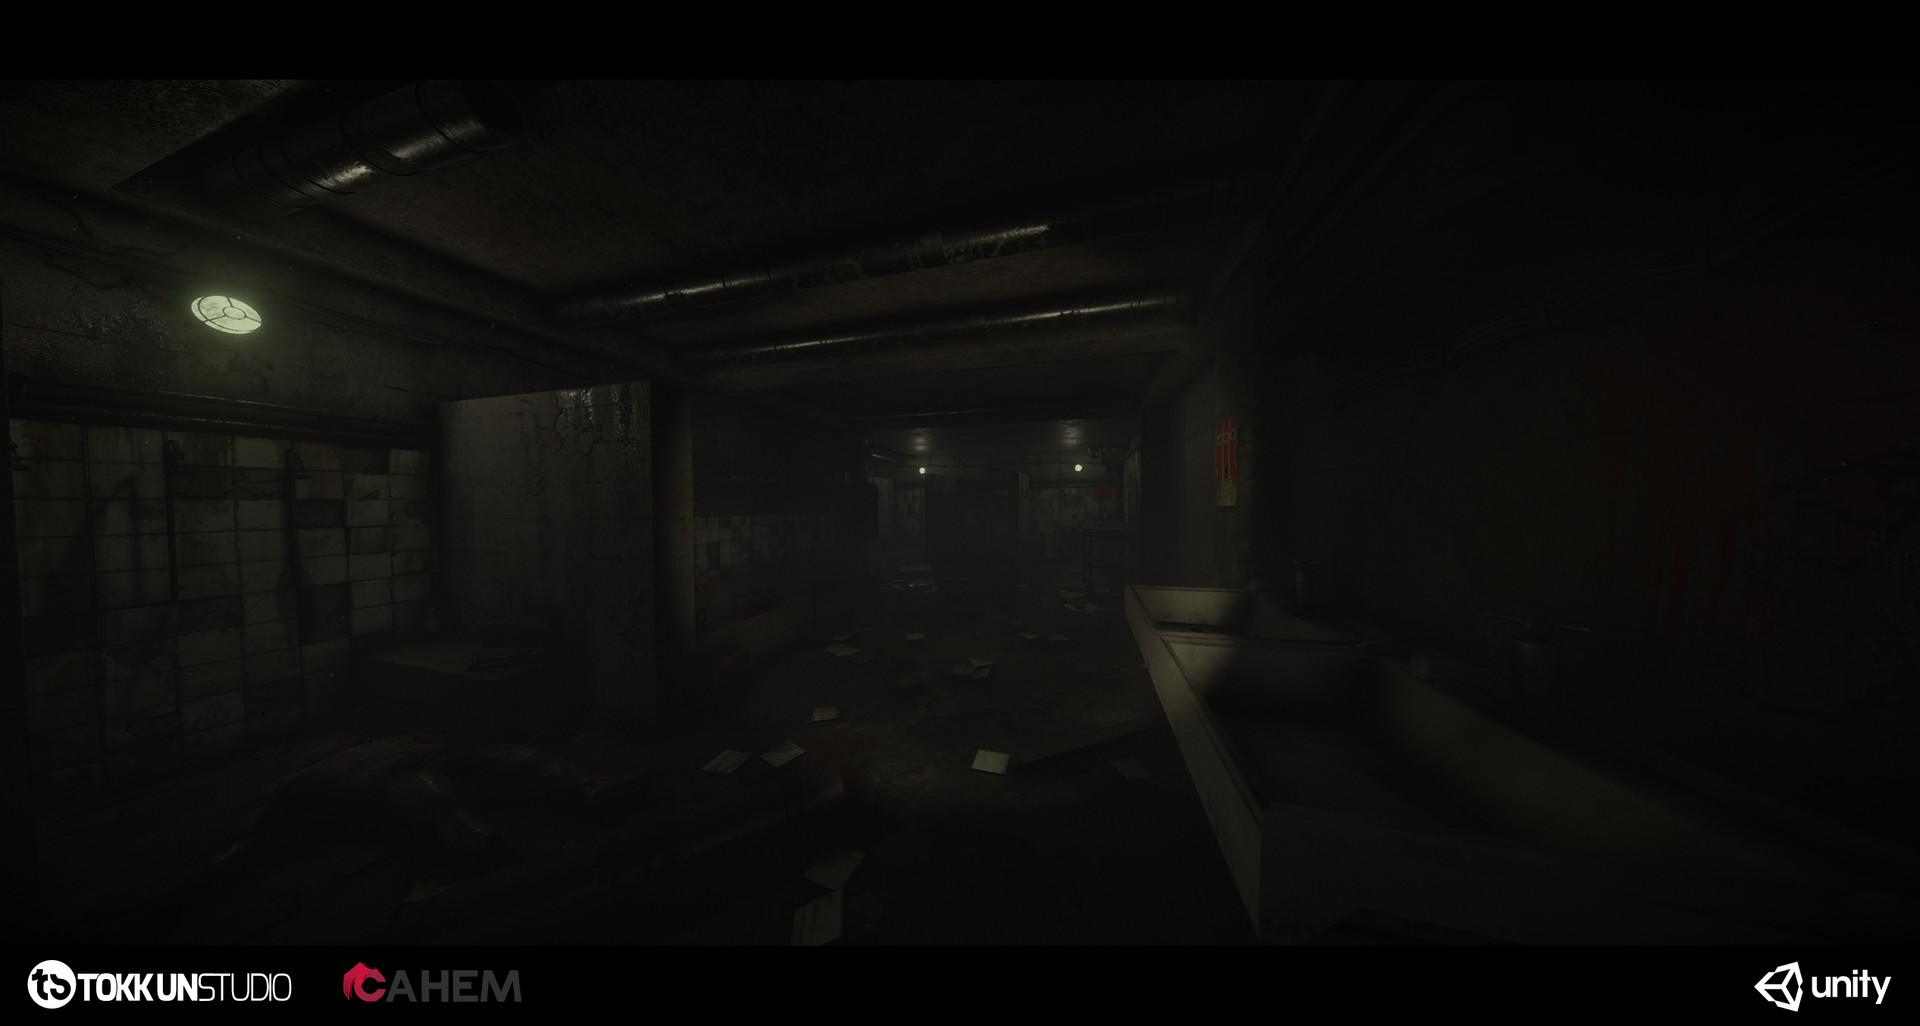 Tokkun studio bunker shot 30